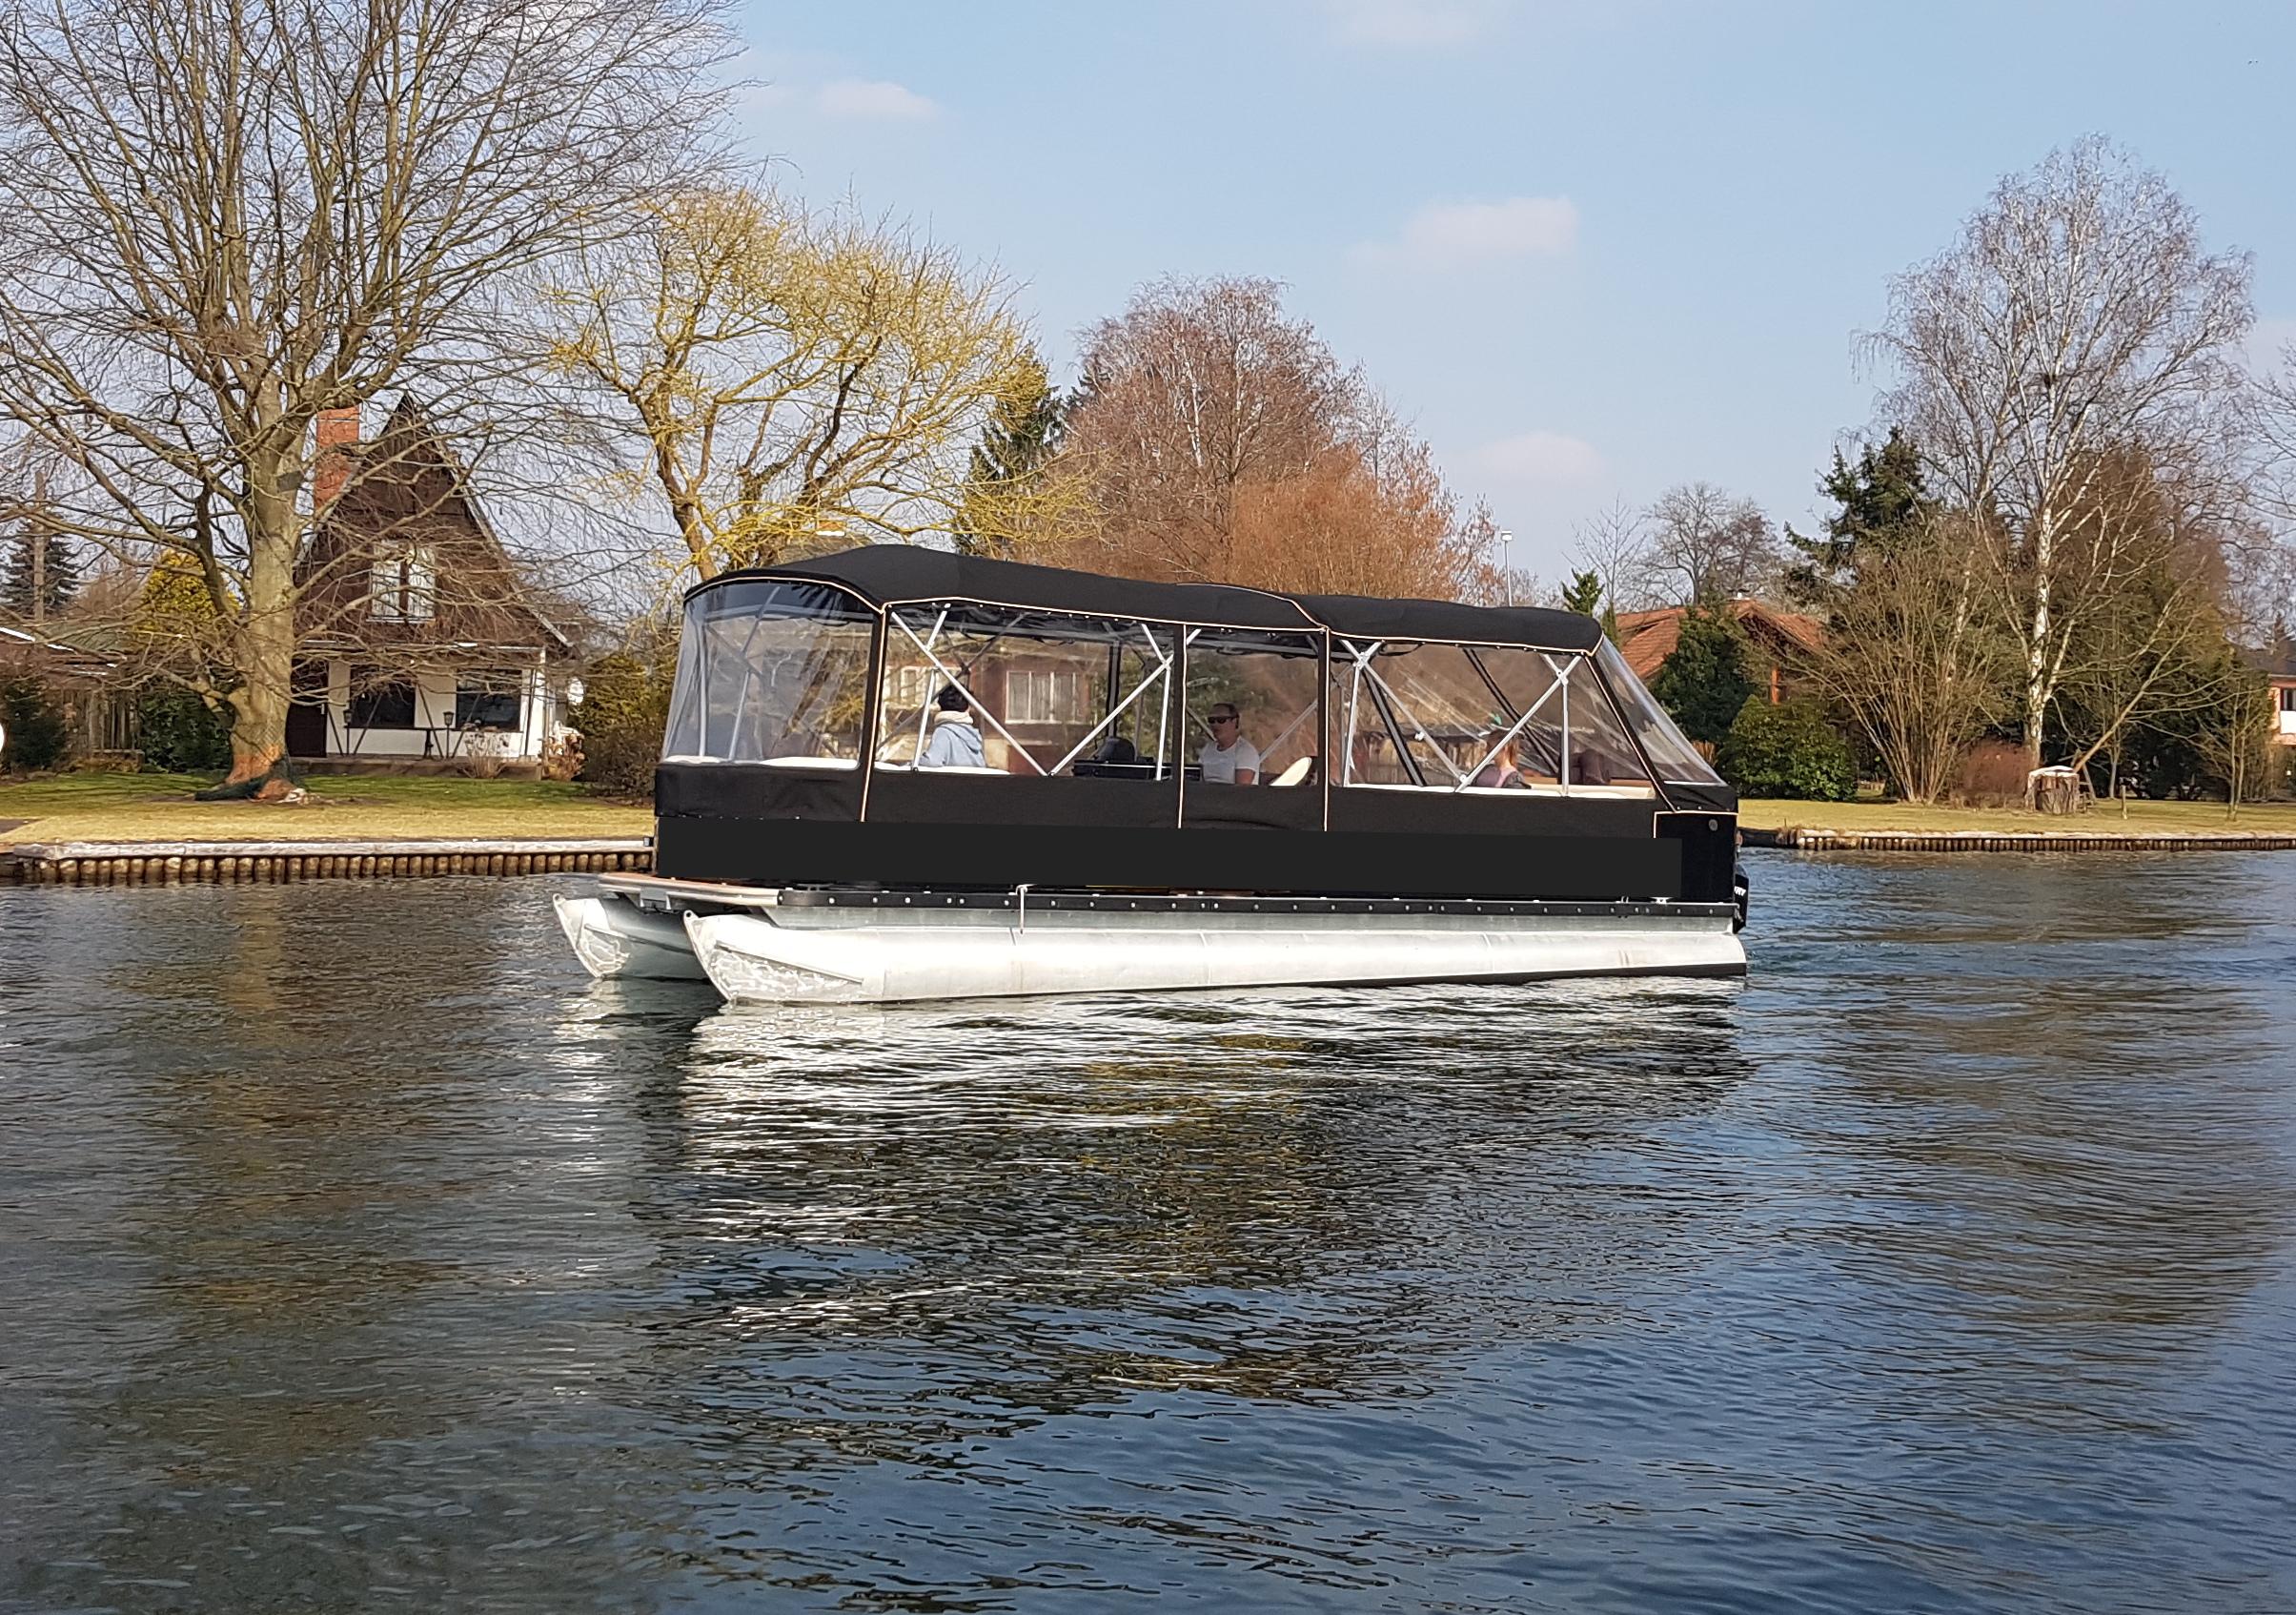 berlin bootsverleih mietboote schiff flo und boot mieten gr nau. Black Bedroom Furniture Sets. Home Design Ideas